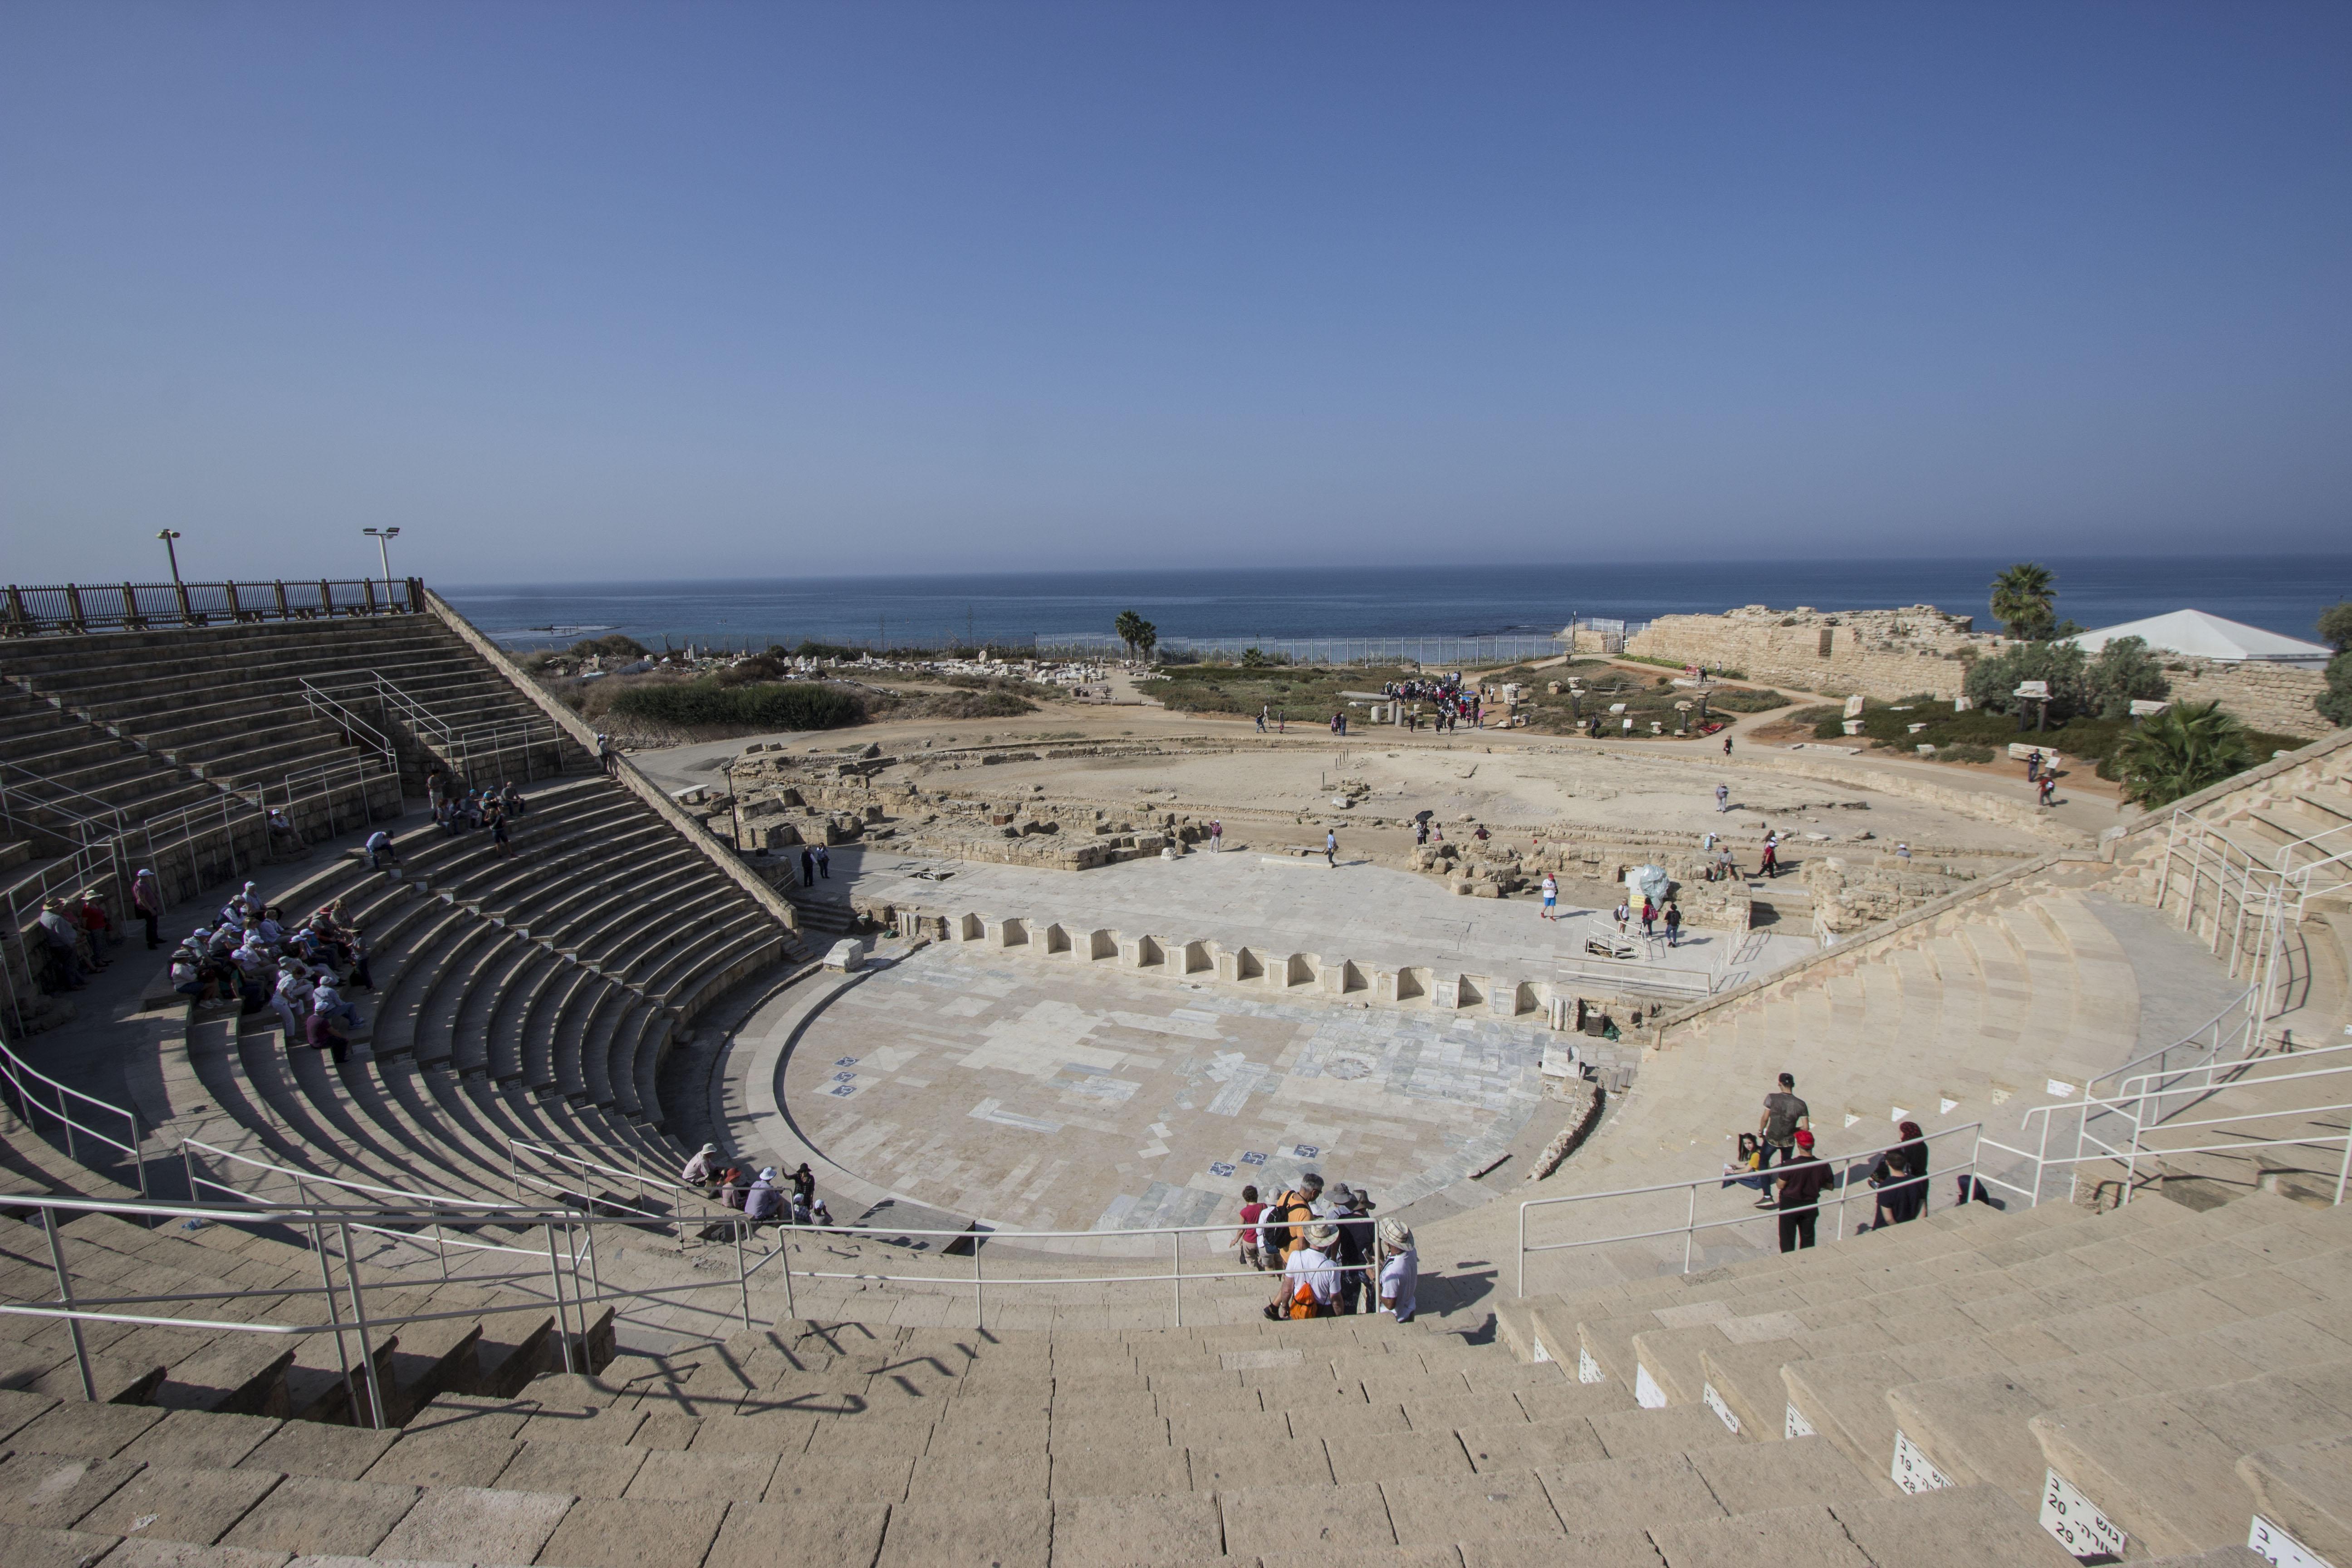 Izrael - Cezarea, amfiteatr